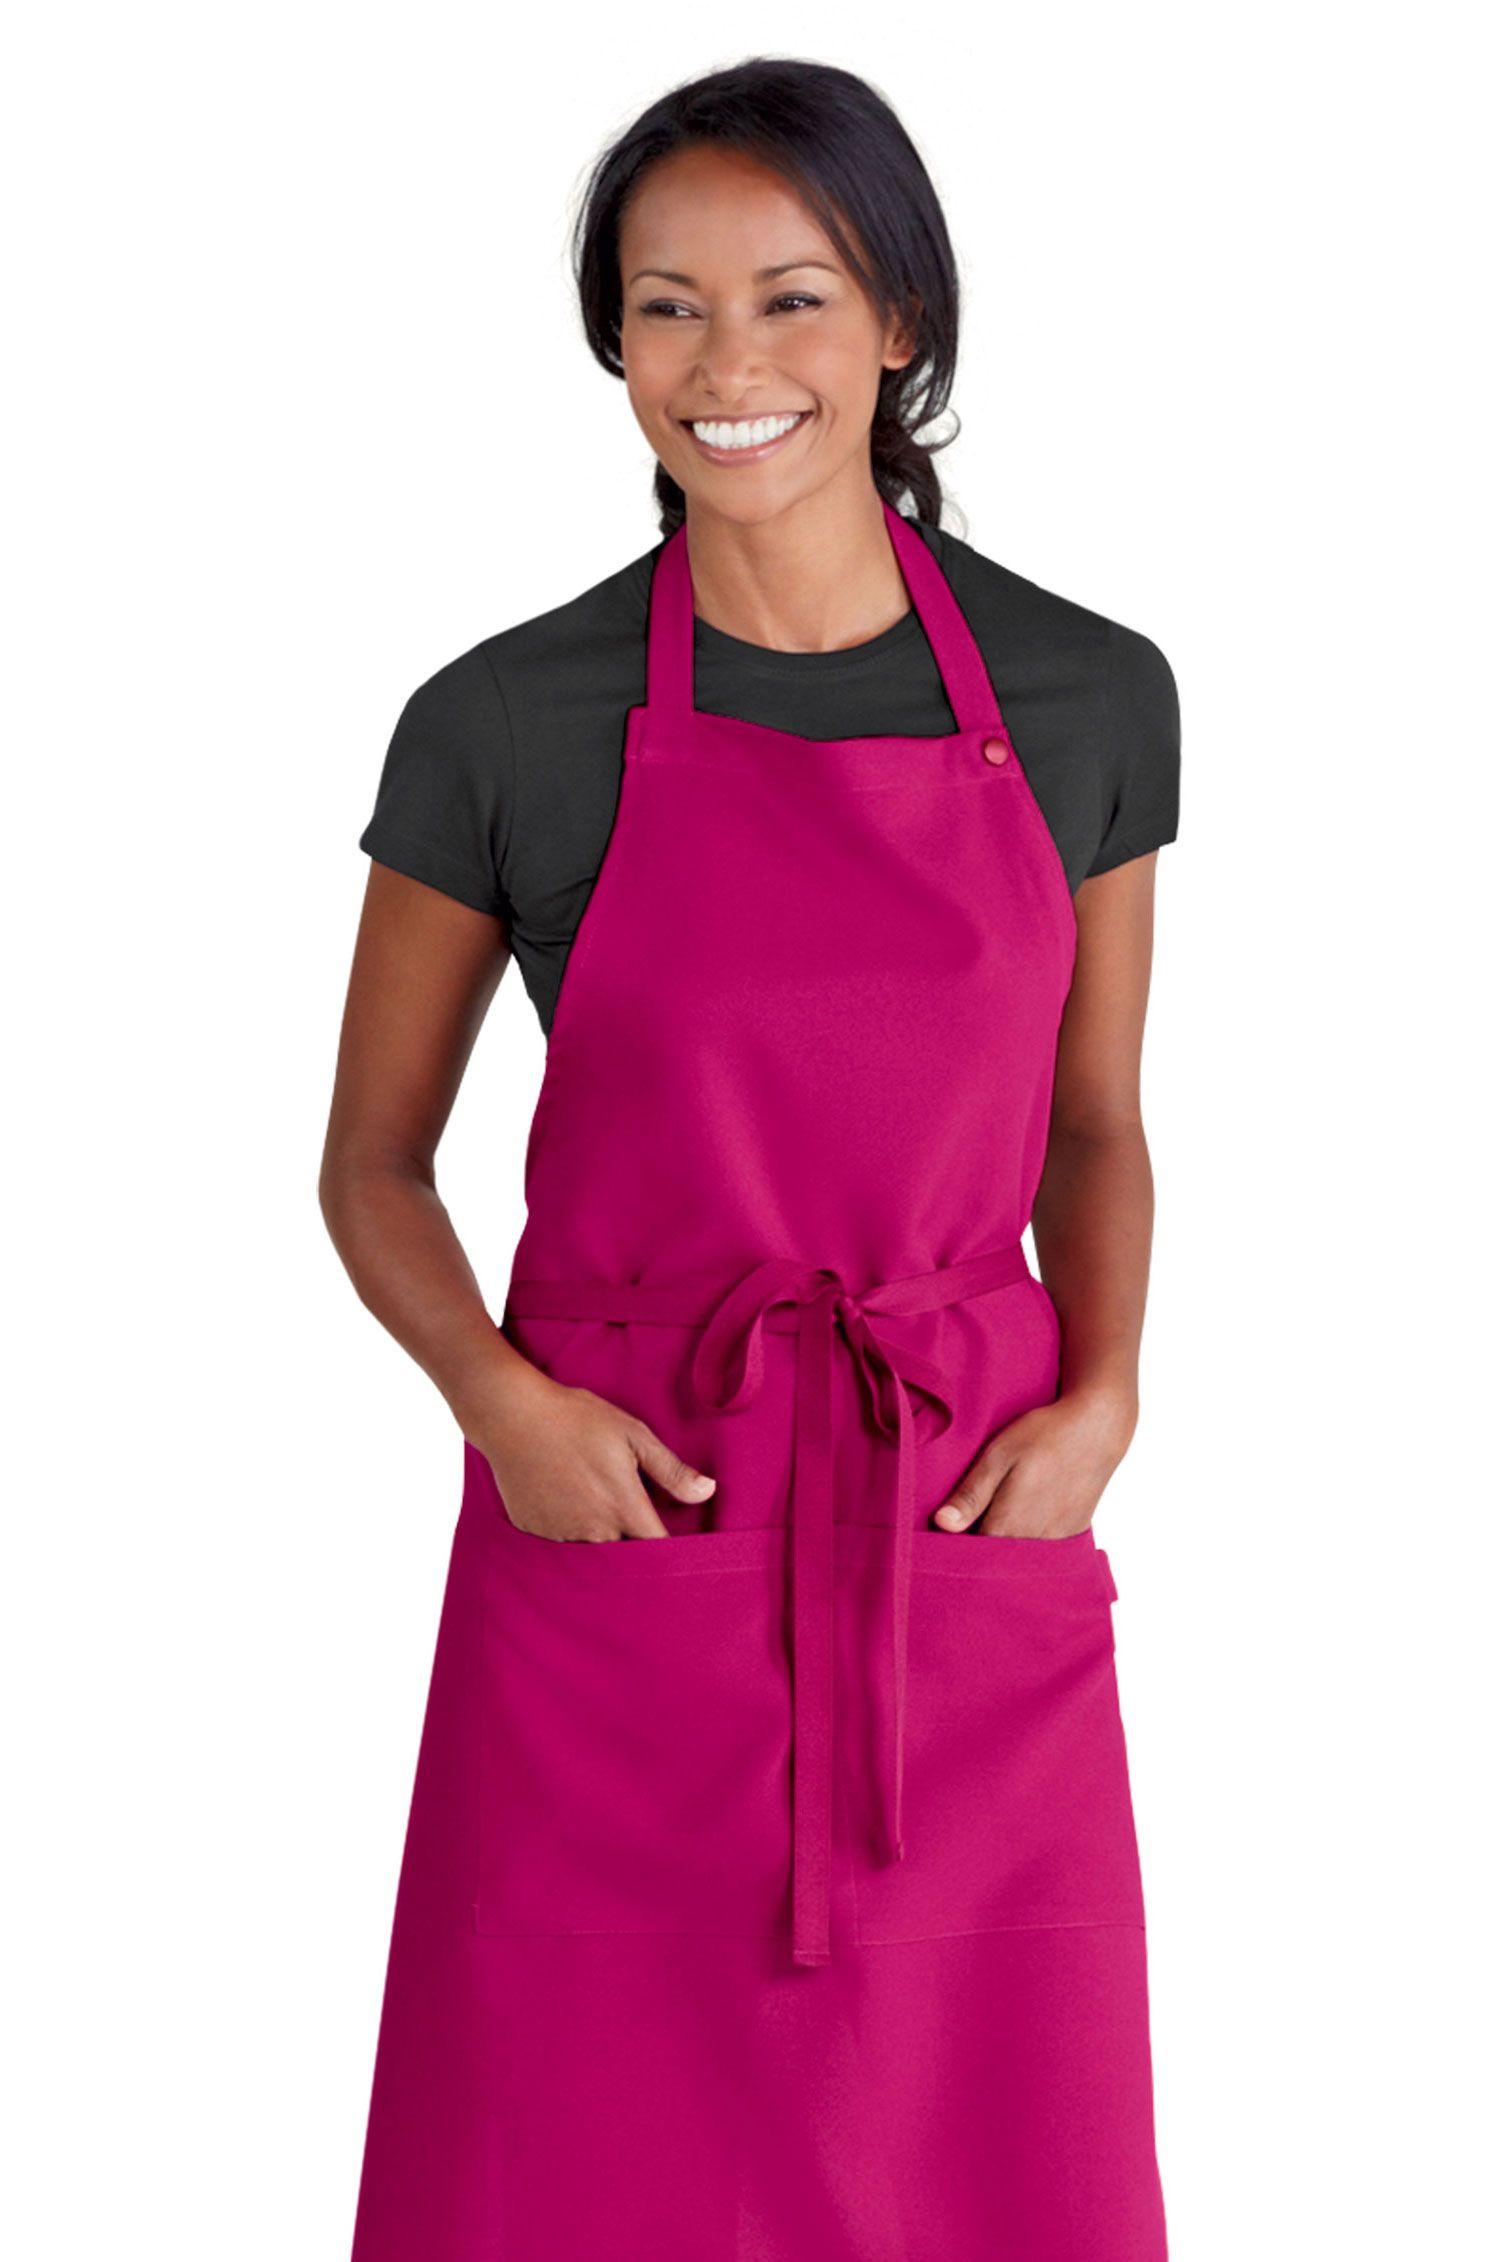 Simon Jersey hot pink bib apron from 6.29 // Waiter apron ...